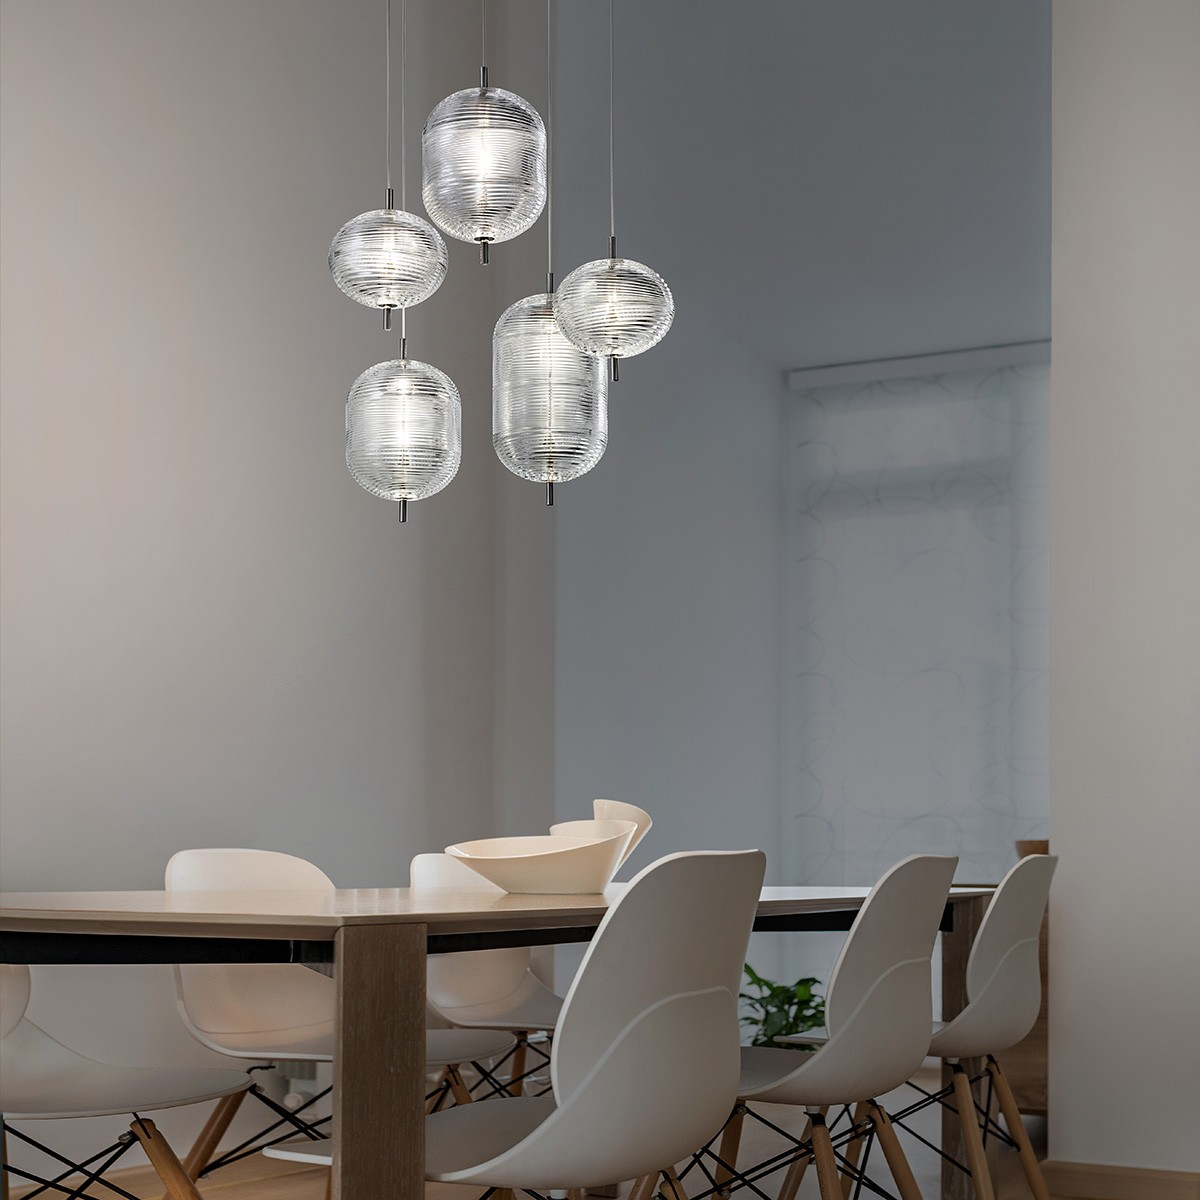 Studio Italia Design Jefferson LED Pendelleuchte, 5-flg., Chrom schwarz - Kristallglas